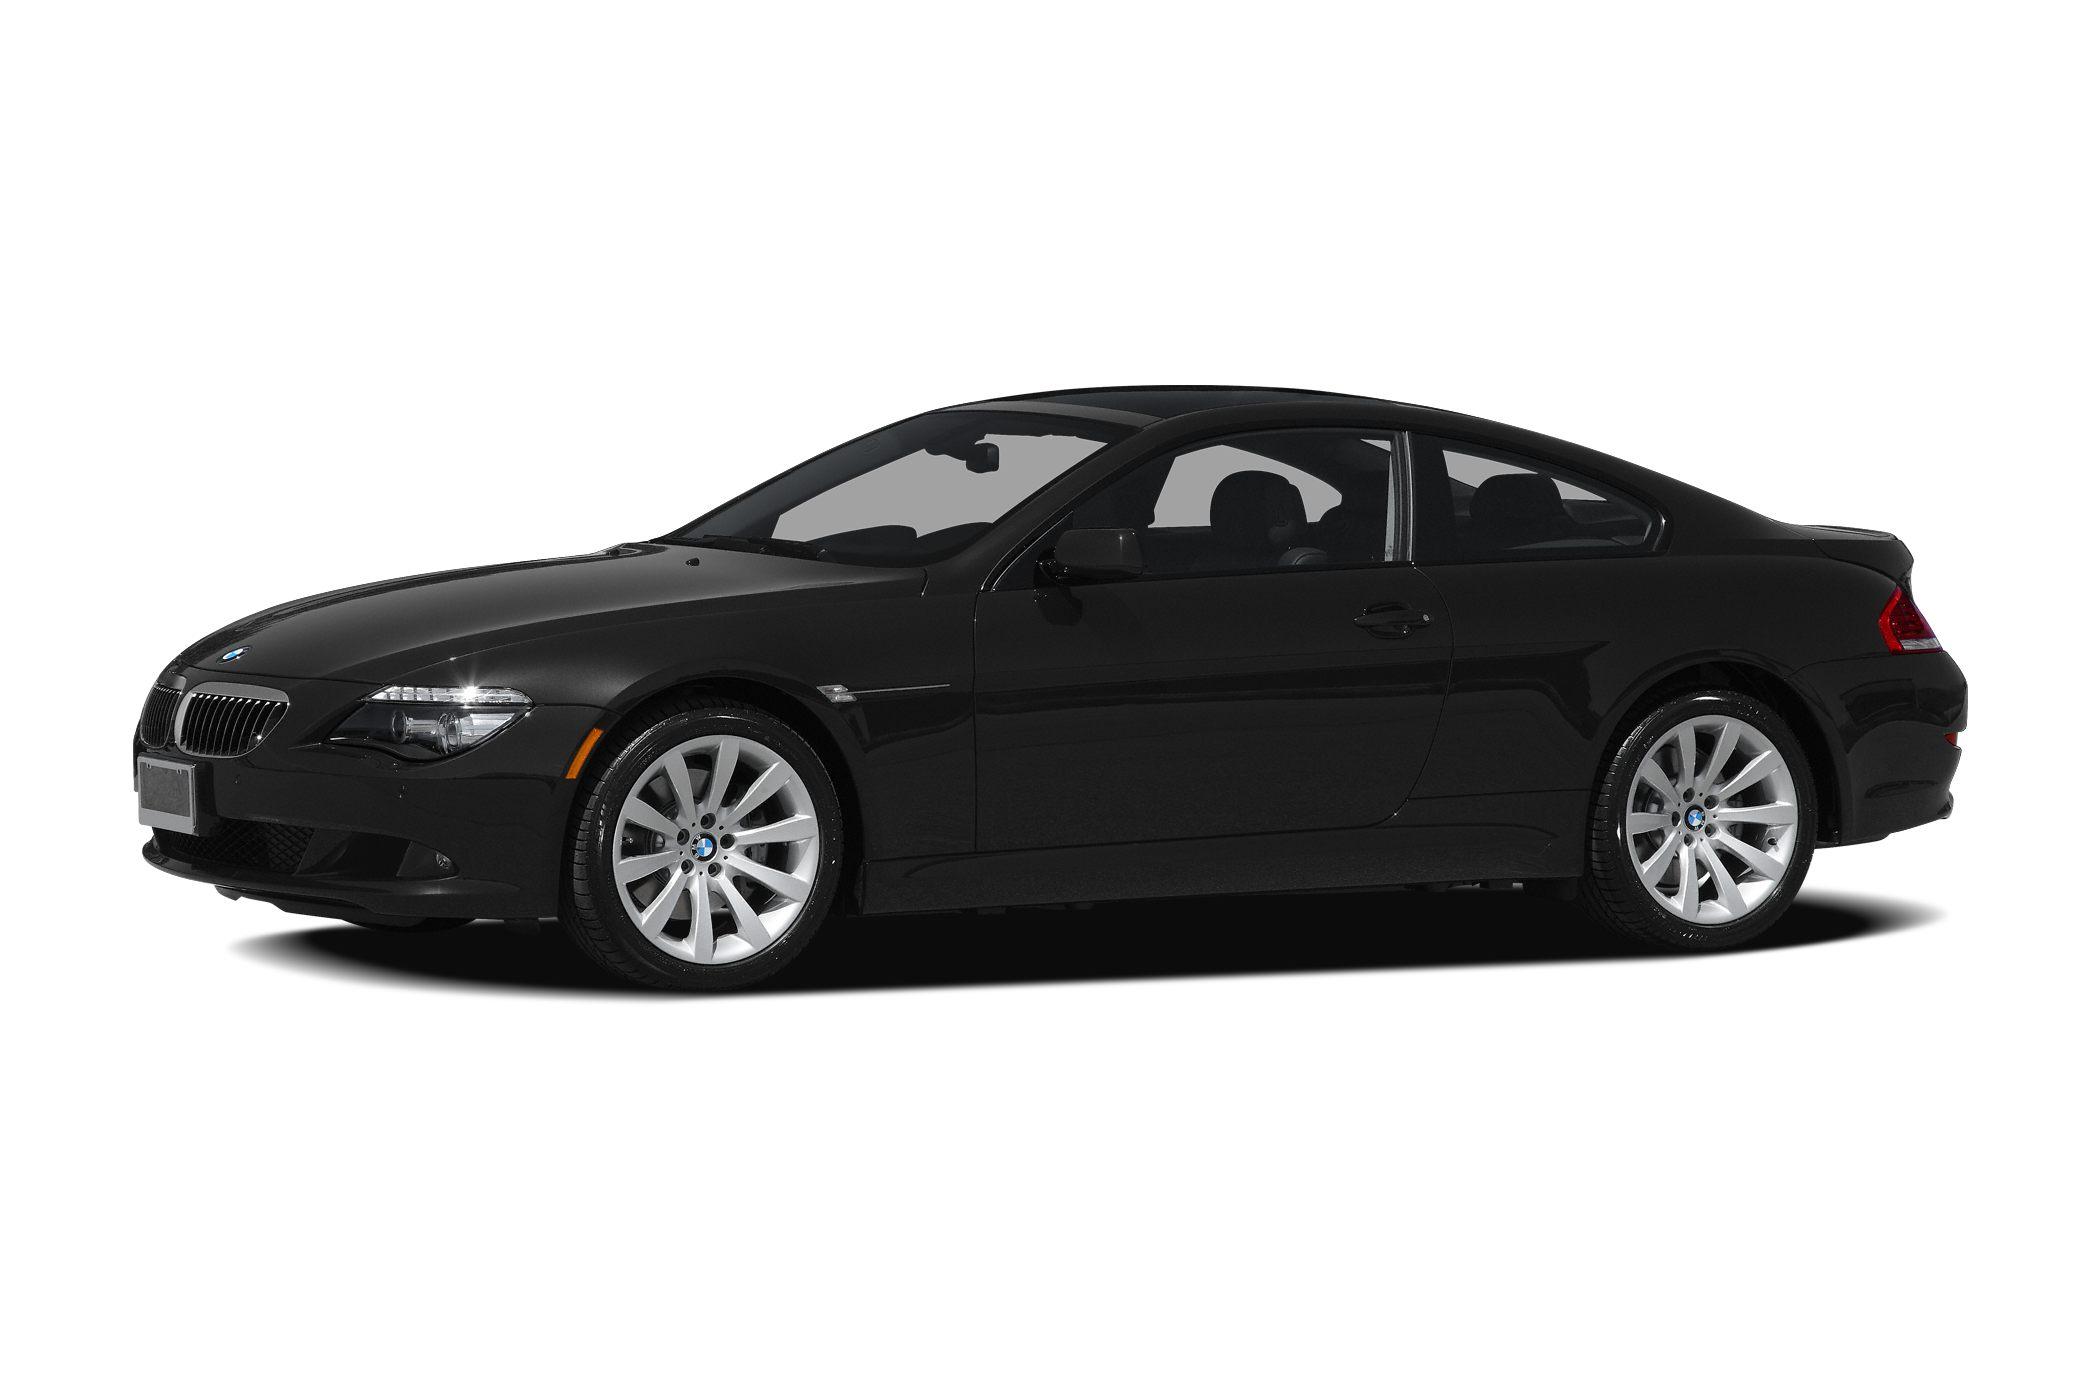 2010 BMW 6 Series 650i Miles 51567Color Blue Stock 16375 VIN WBAEA5C59ACV85228